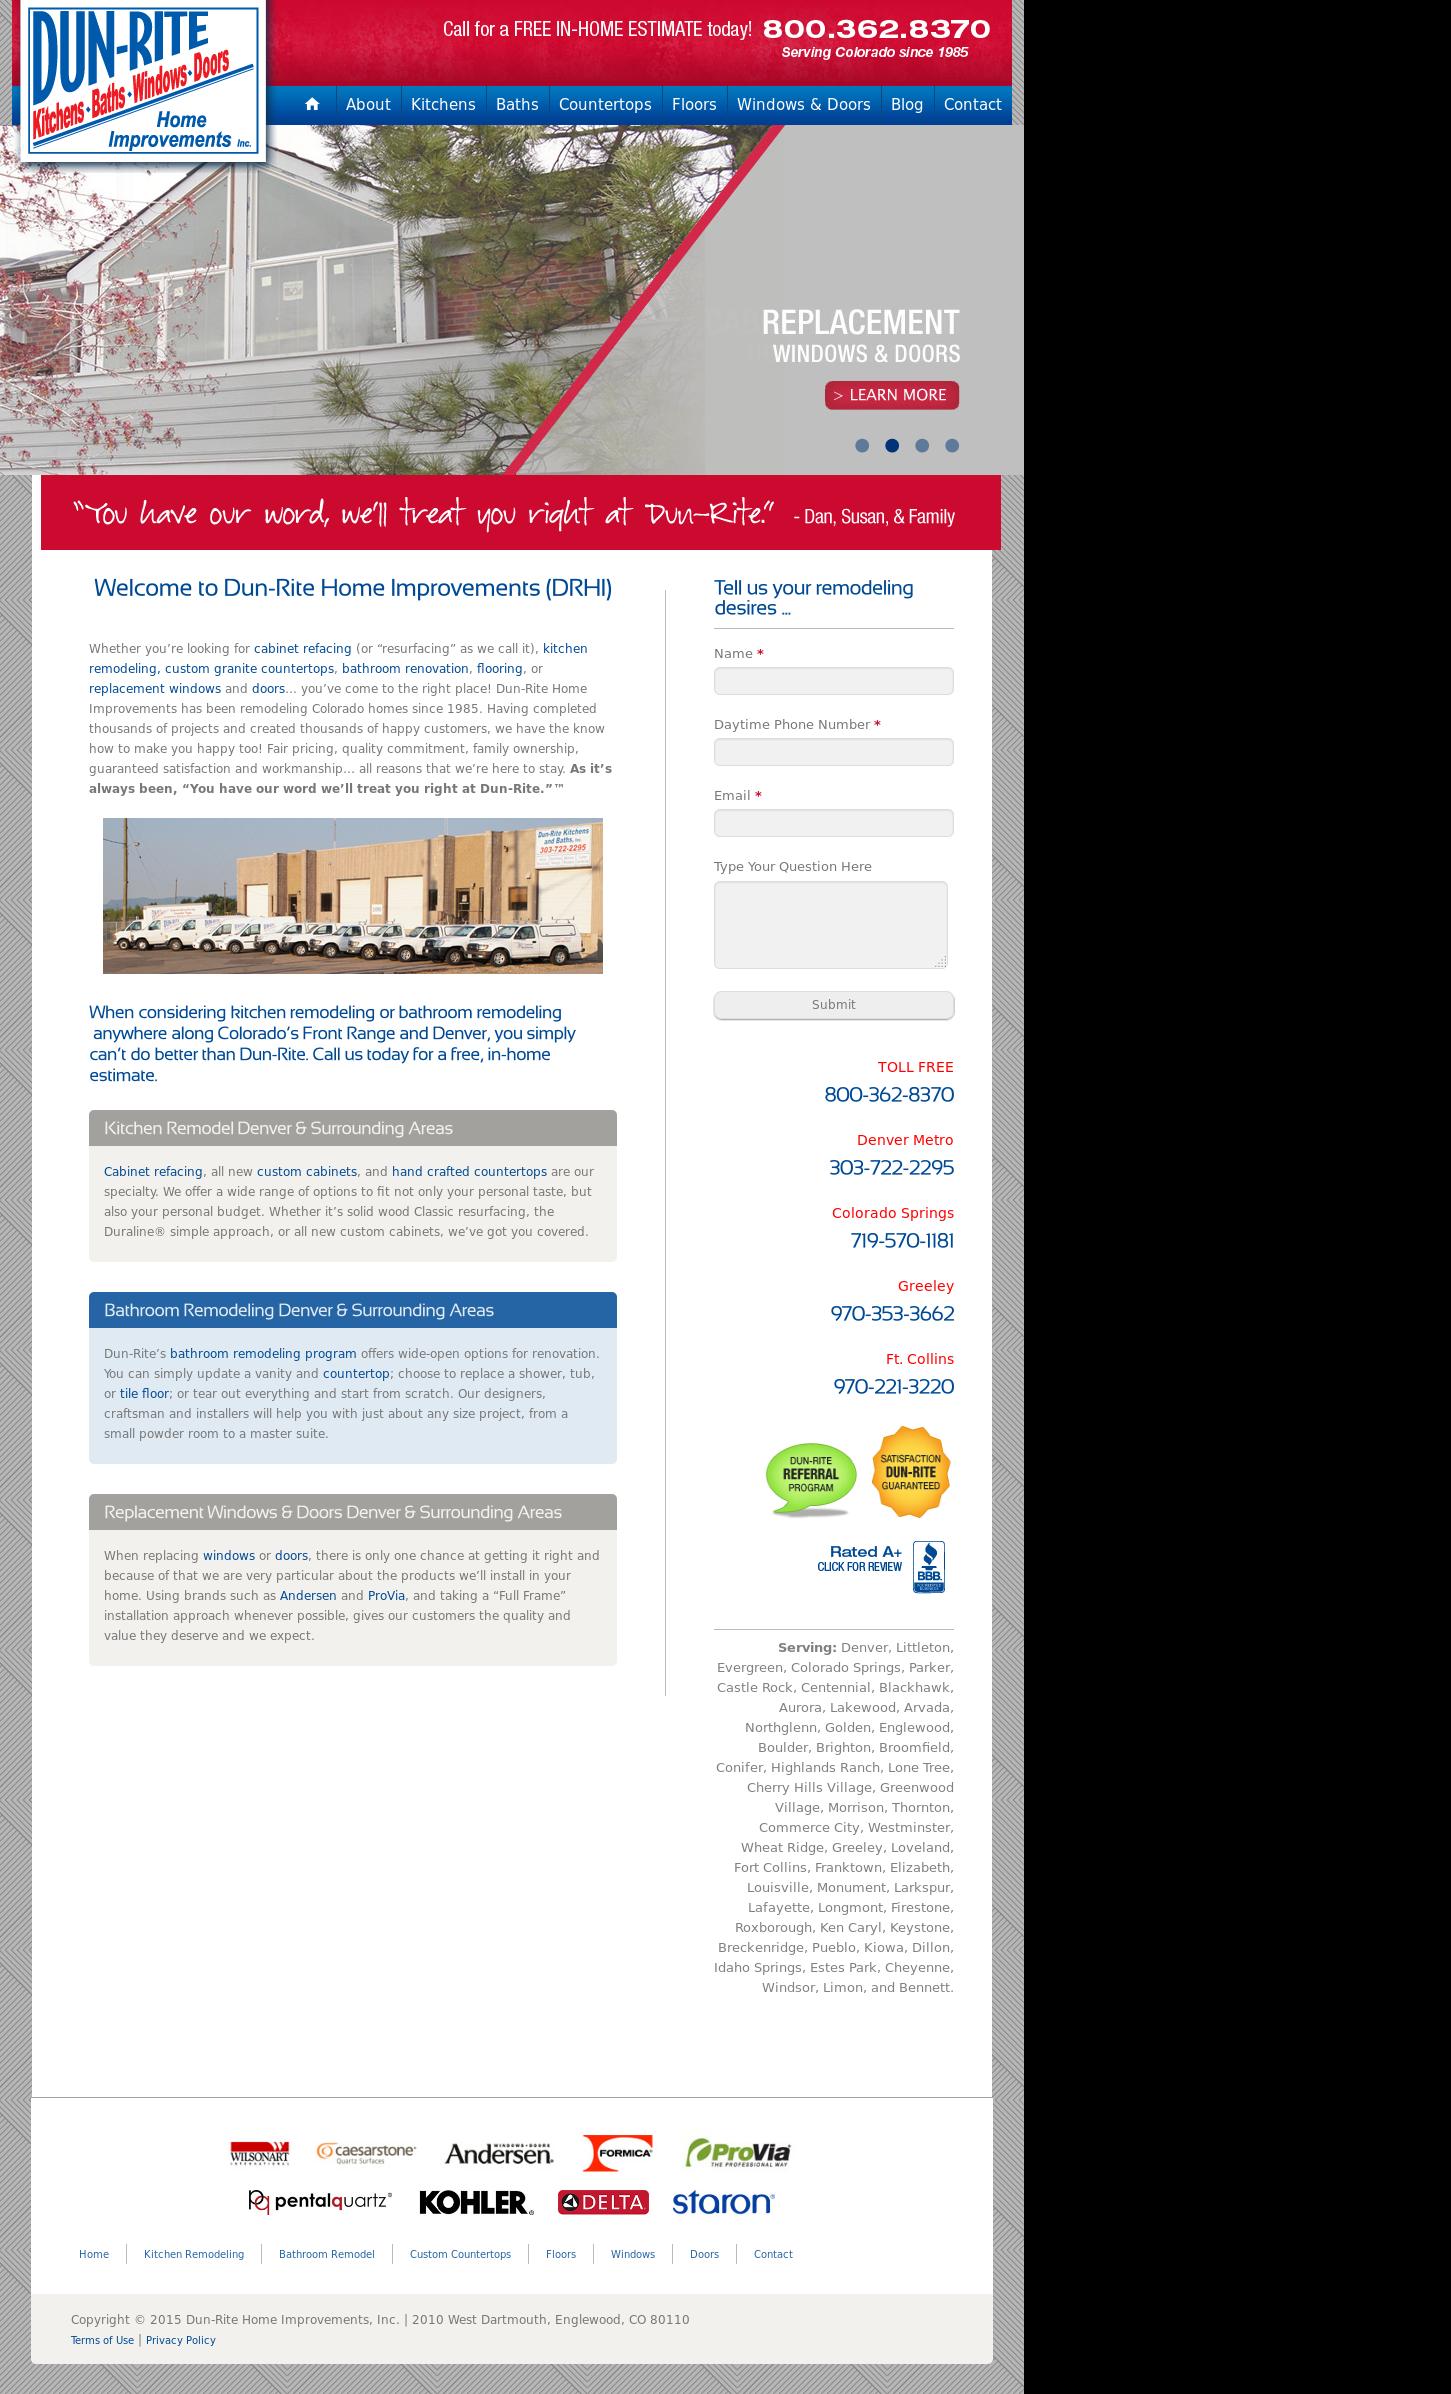 Dun Rite Home Improvements Website History